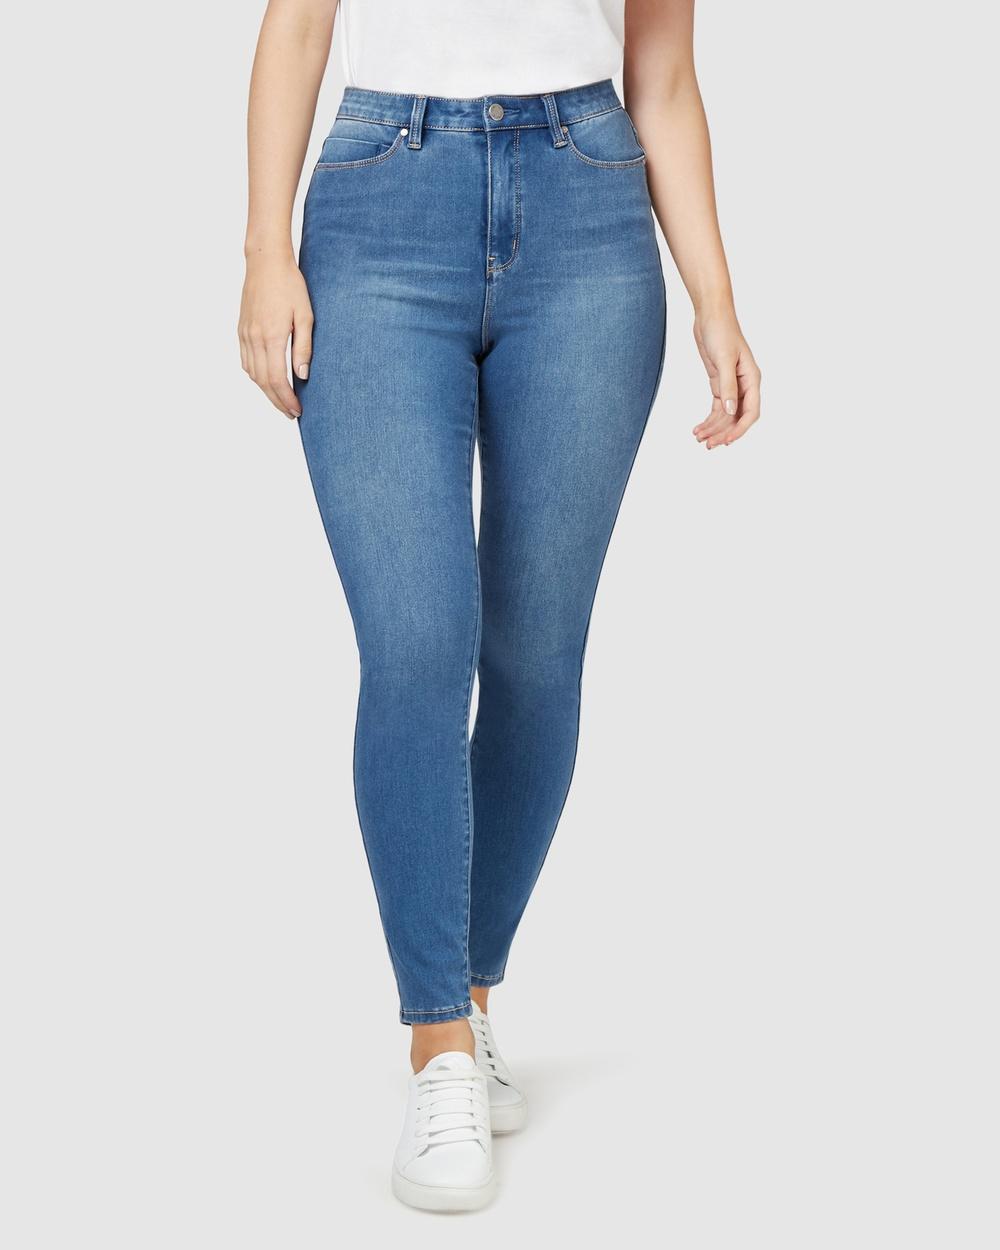 Jeanswest Freeform 360 Contour Curve Embracer High Waisted Skinny 7 8 Jeans True Blue High-Waisted True Blue 7-8 Australia